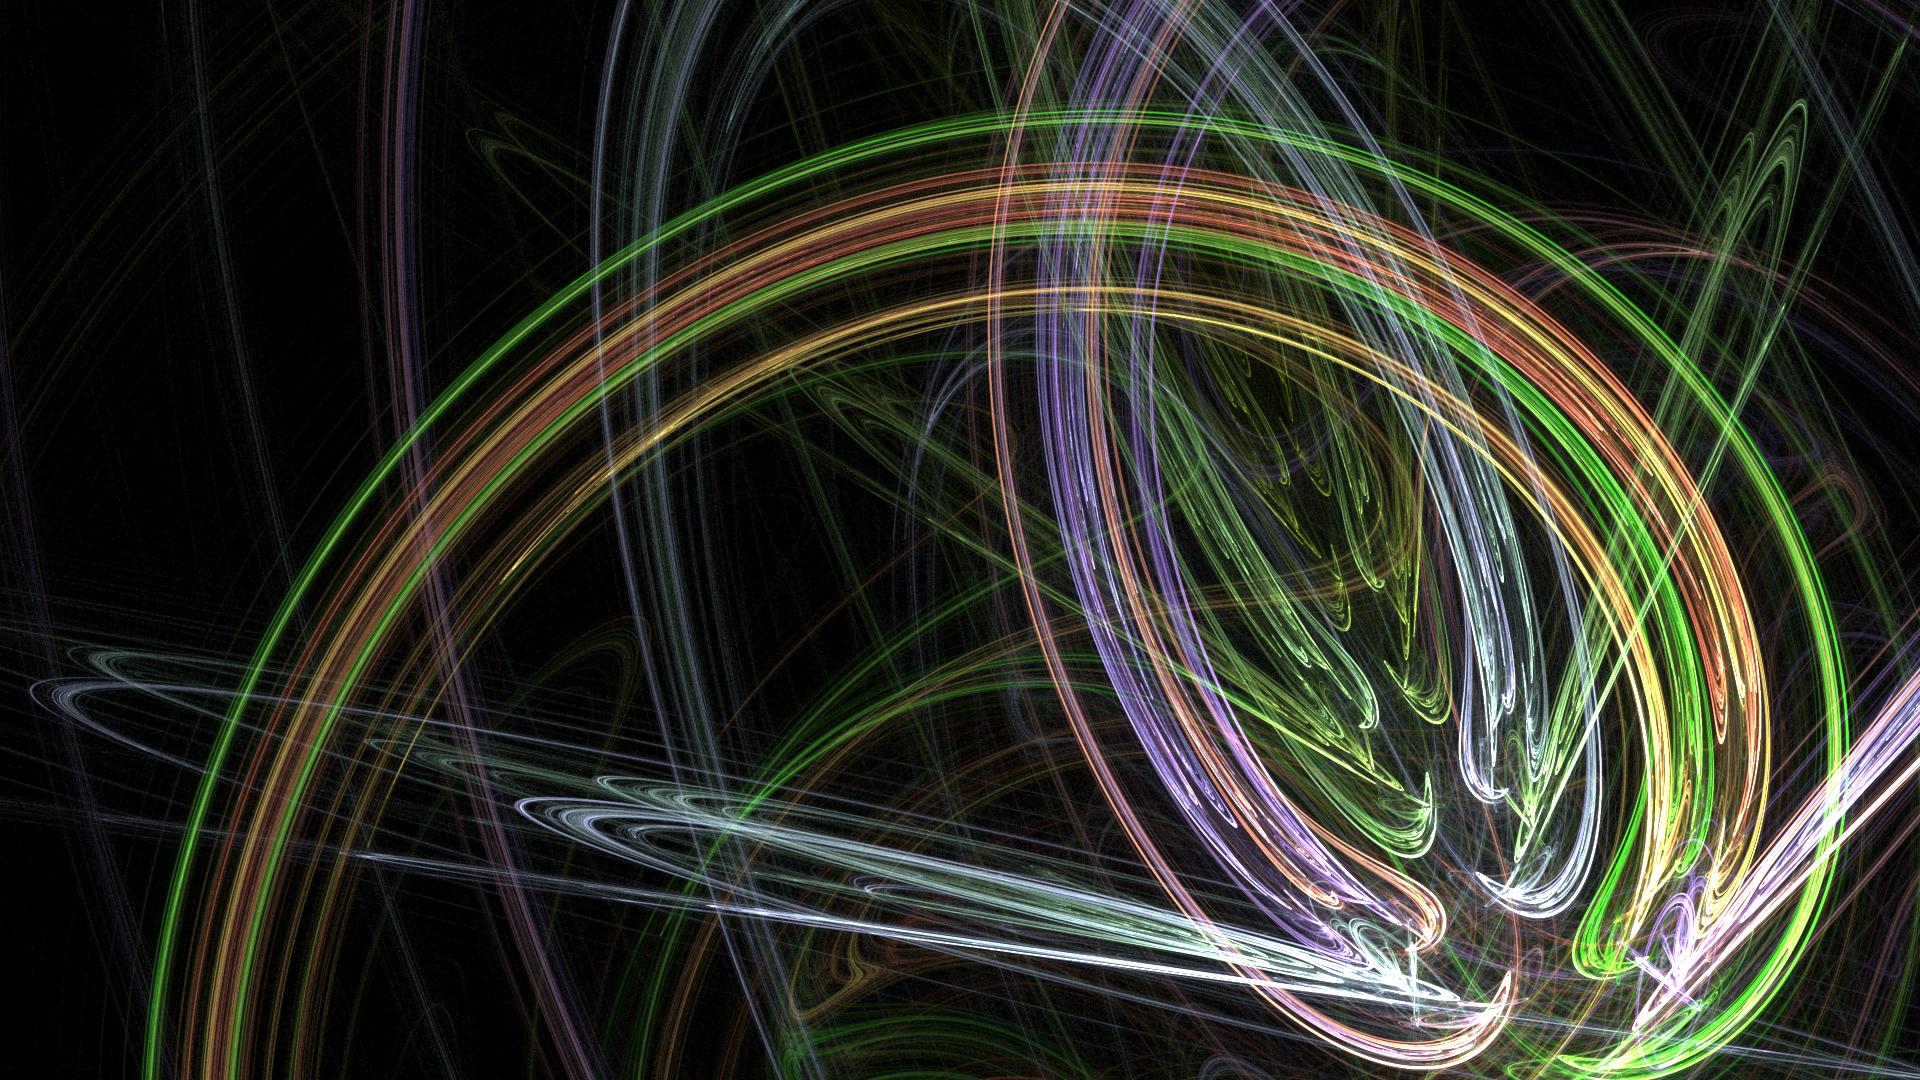 AGNX-NXVS-TheDreamofAnAngel-222